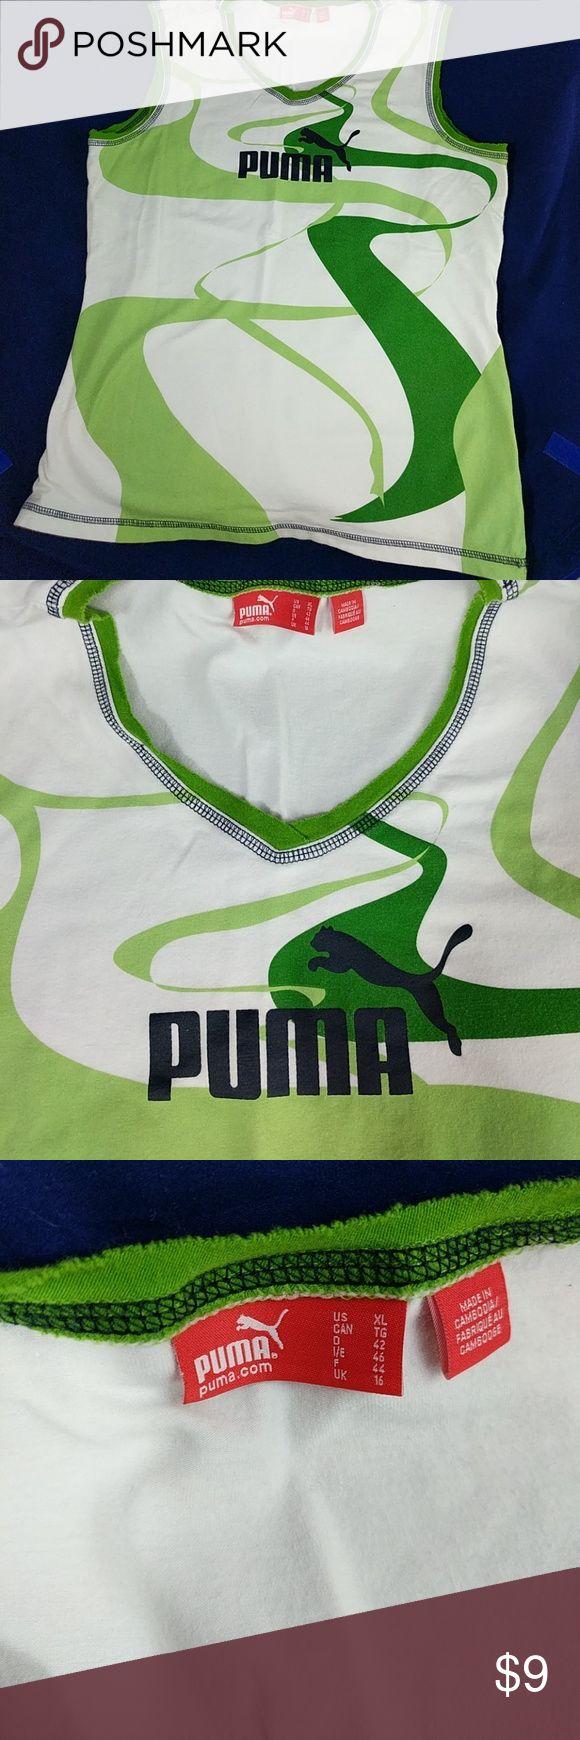 "Puma sleeveless t-shirt XL Puma green and white sleeveless t-shirt.  23"" too to bottom; 18"" arm pit to arm pit.  Slight ink mark near hemline on the lower right side, S shown. Puma Tops Muscle Tees"